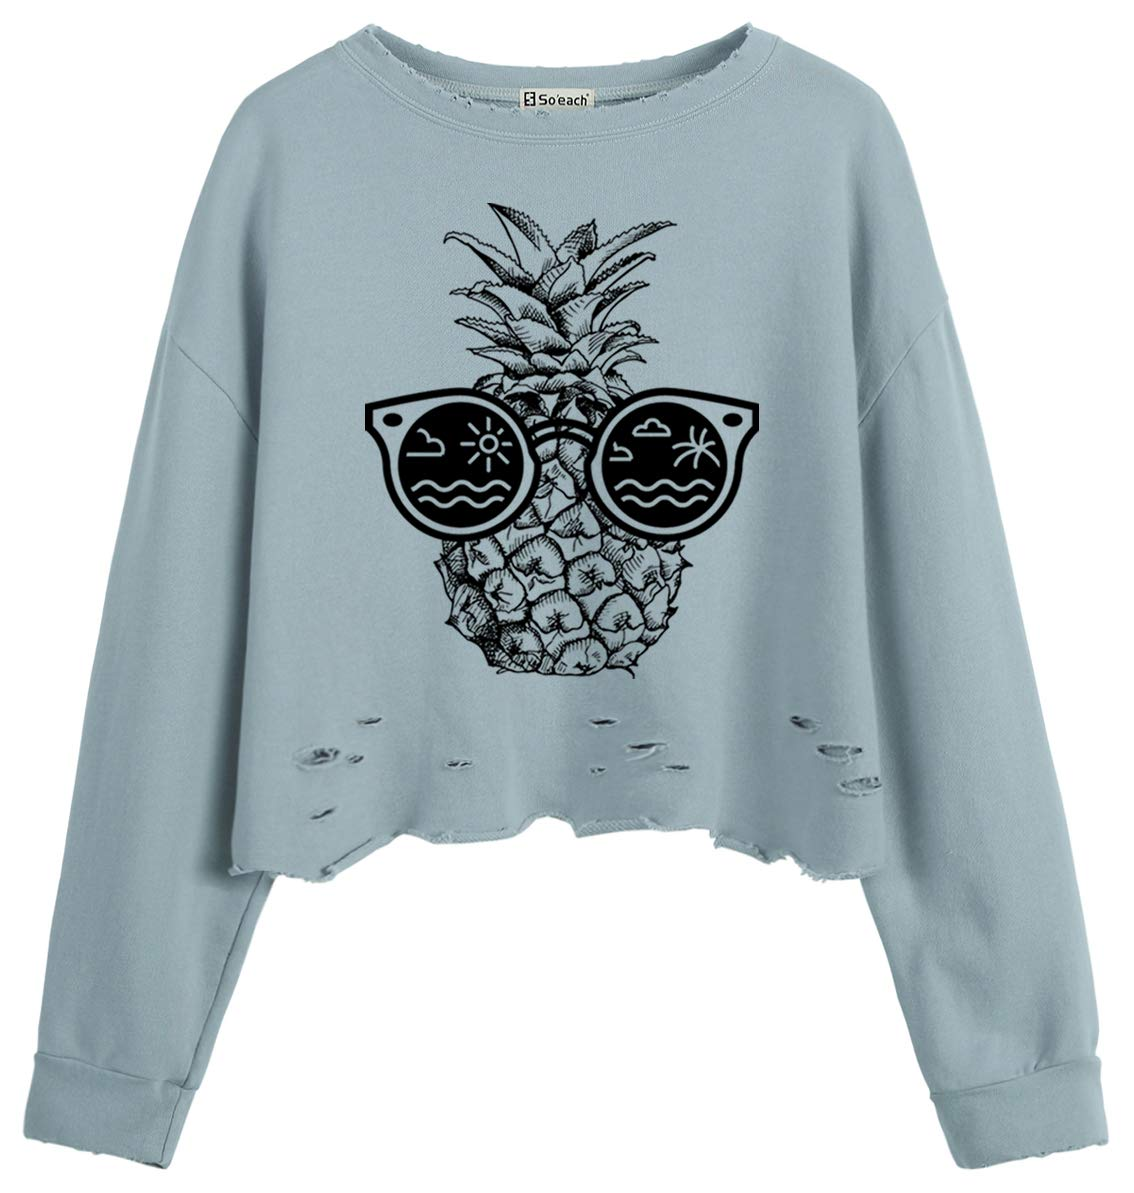 So'each Women Jumper Sweatshirt Sunglasses Pineapple Graphic Crop Top Blue